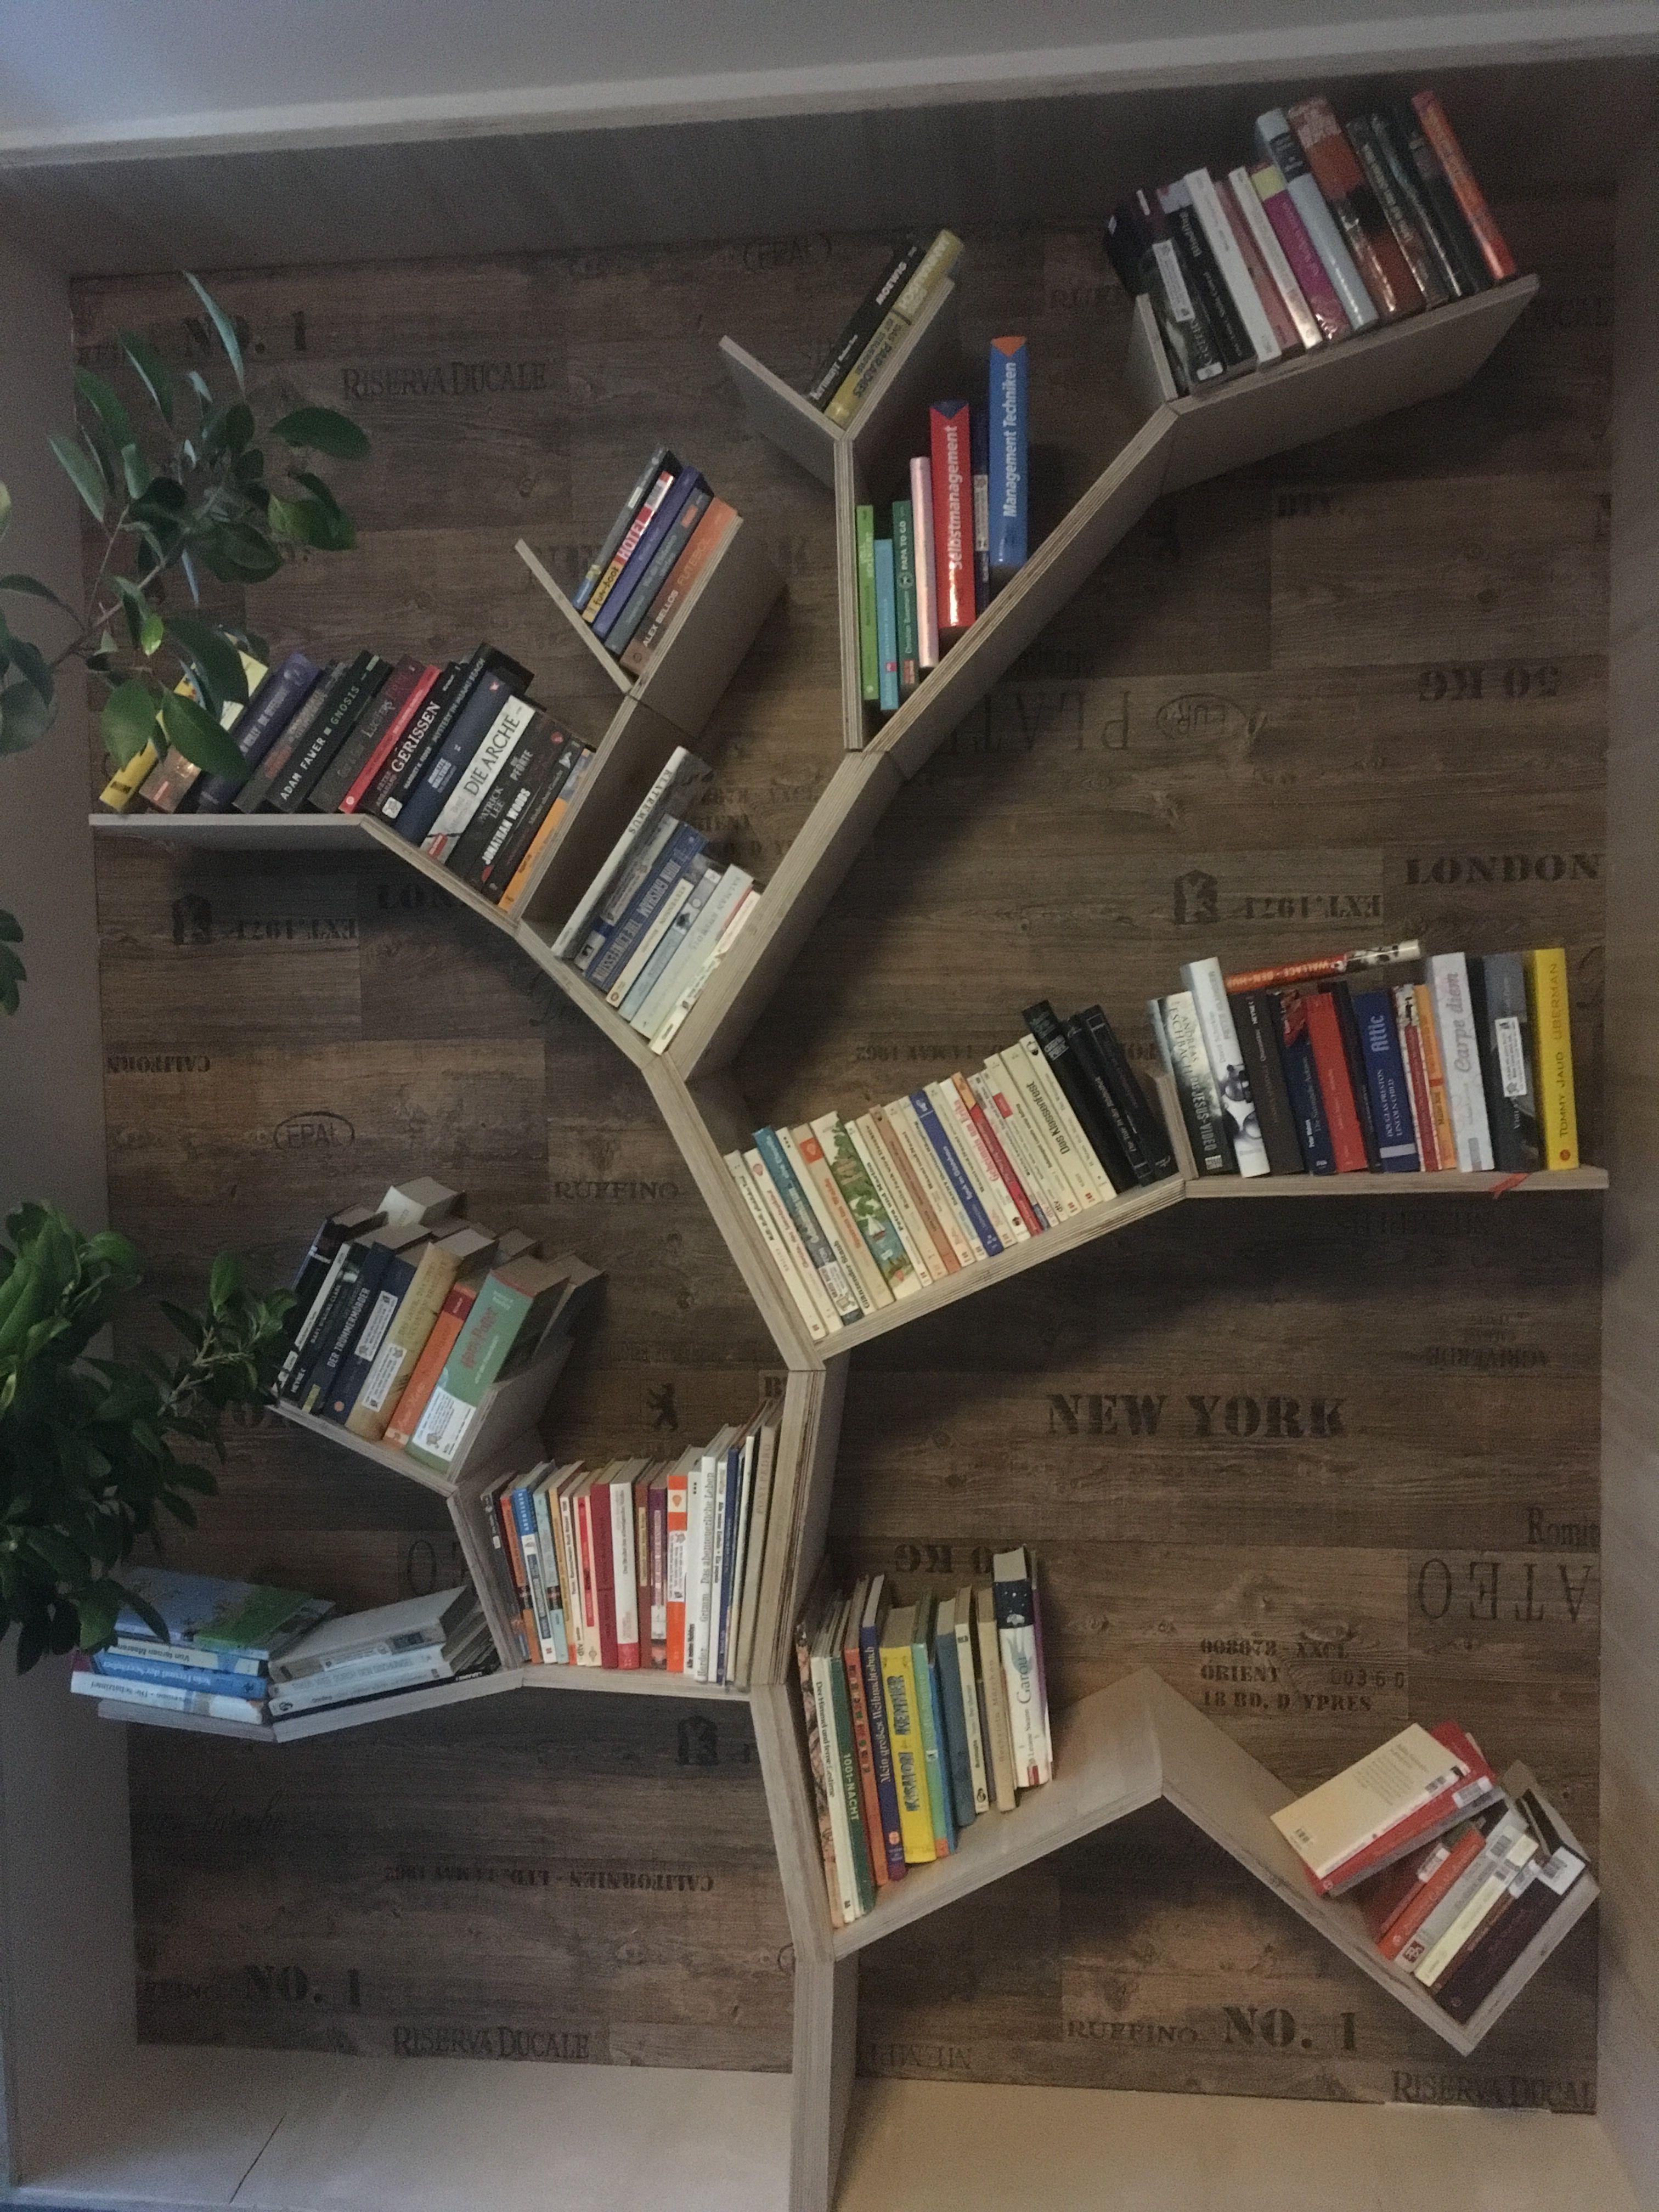 bücherregal als baum #bookshelf #treeshelf #bookcrossing #books #diy